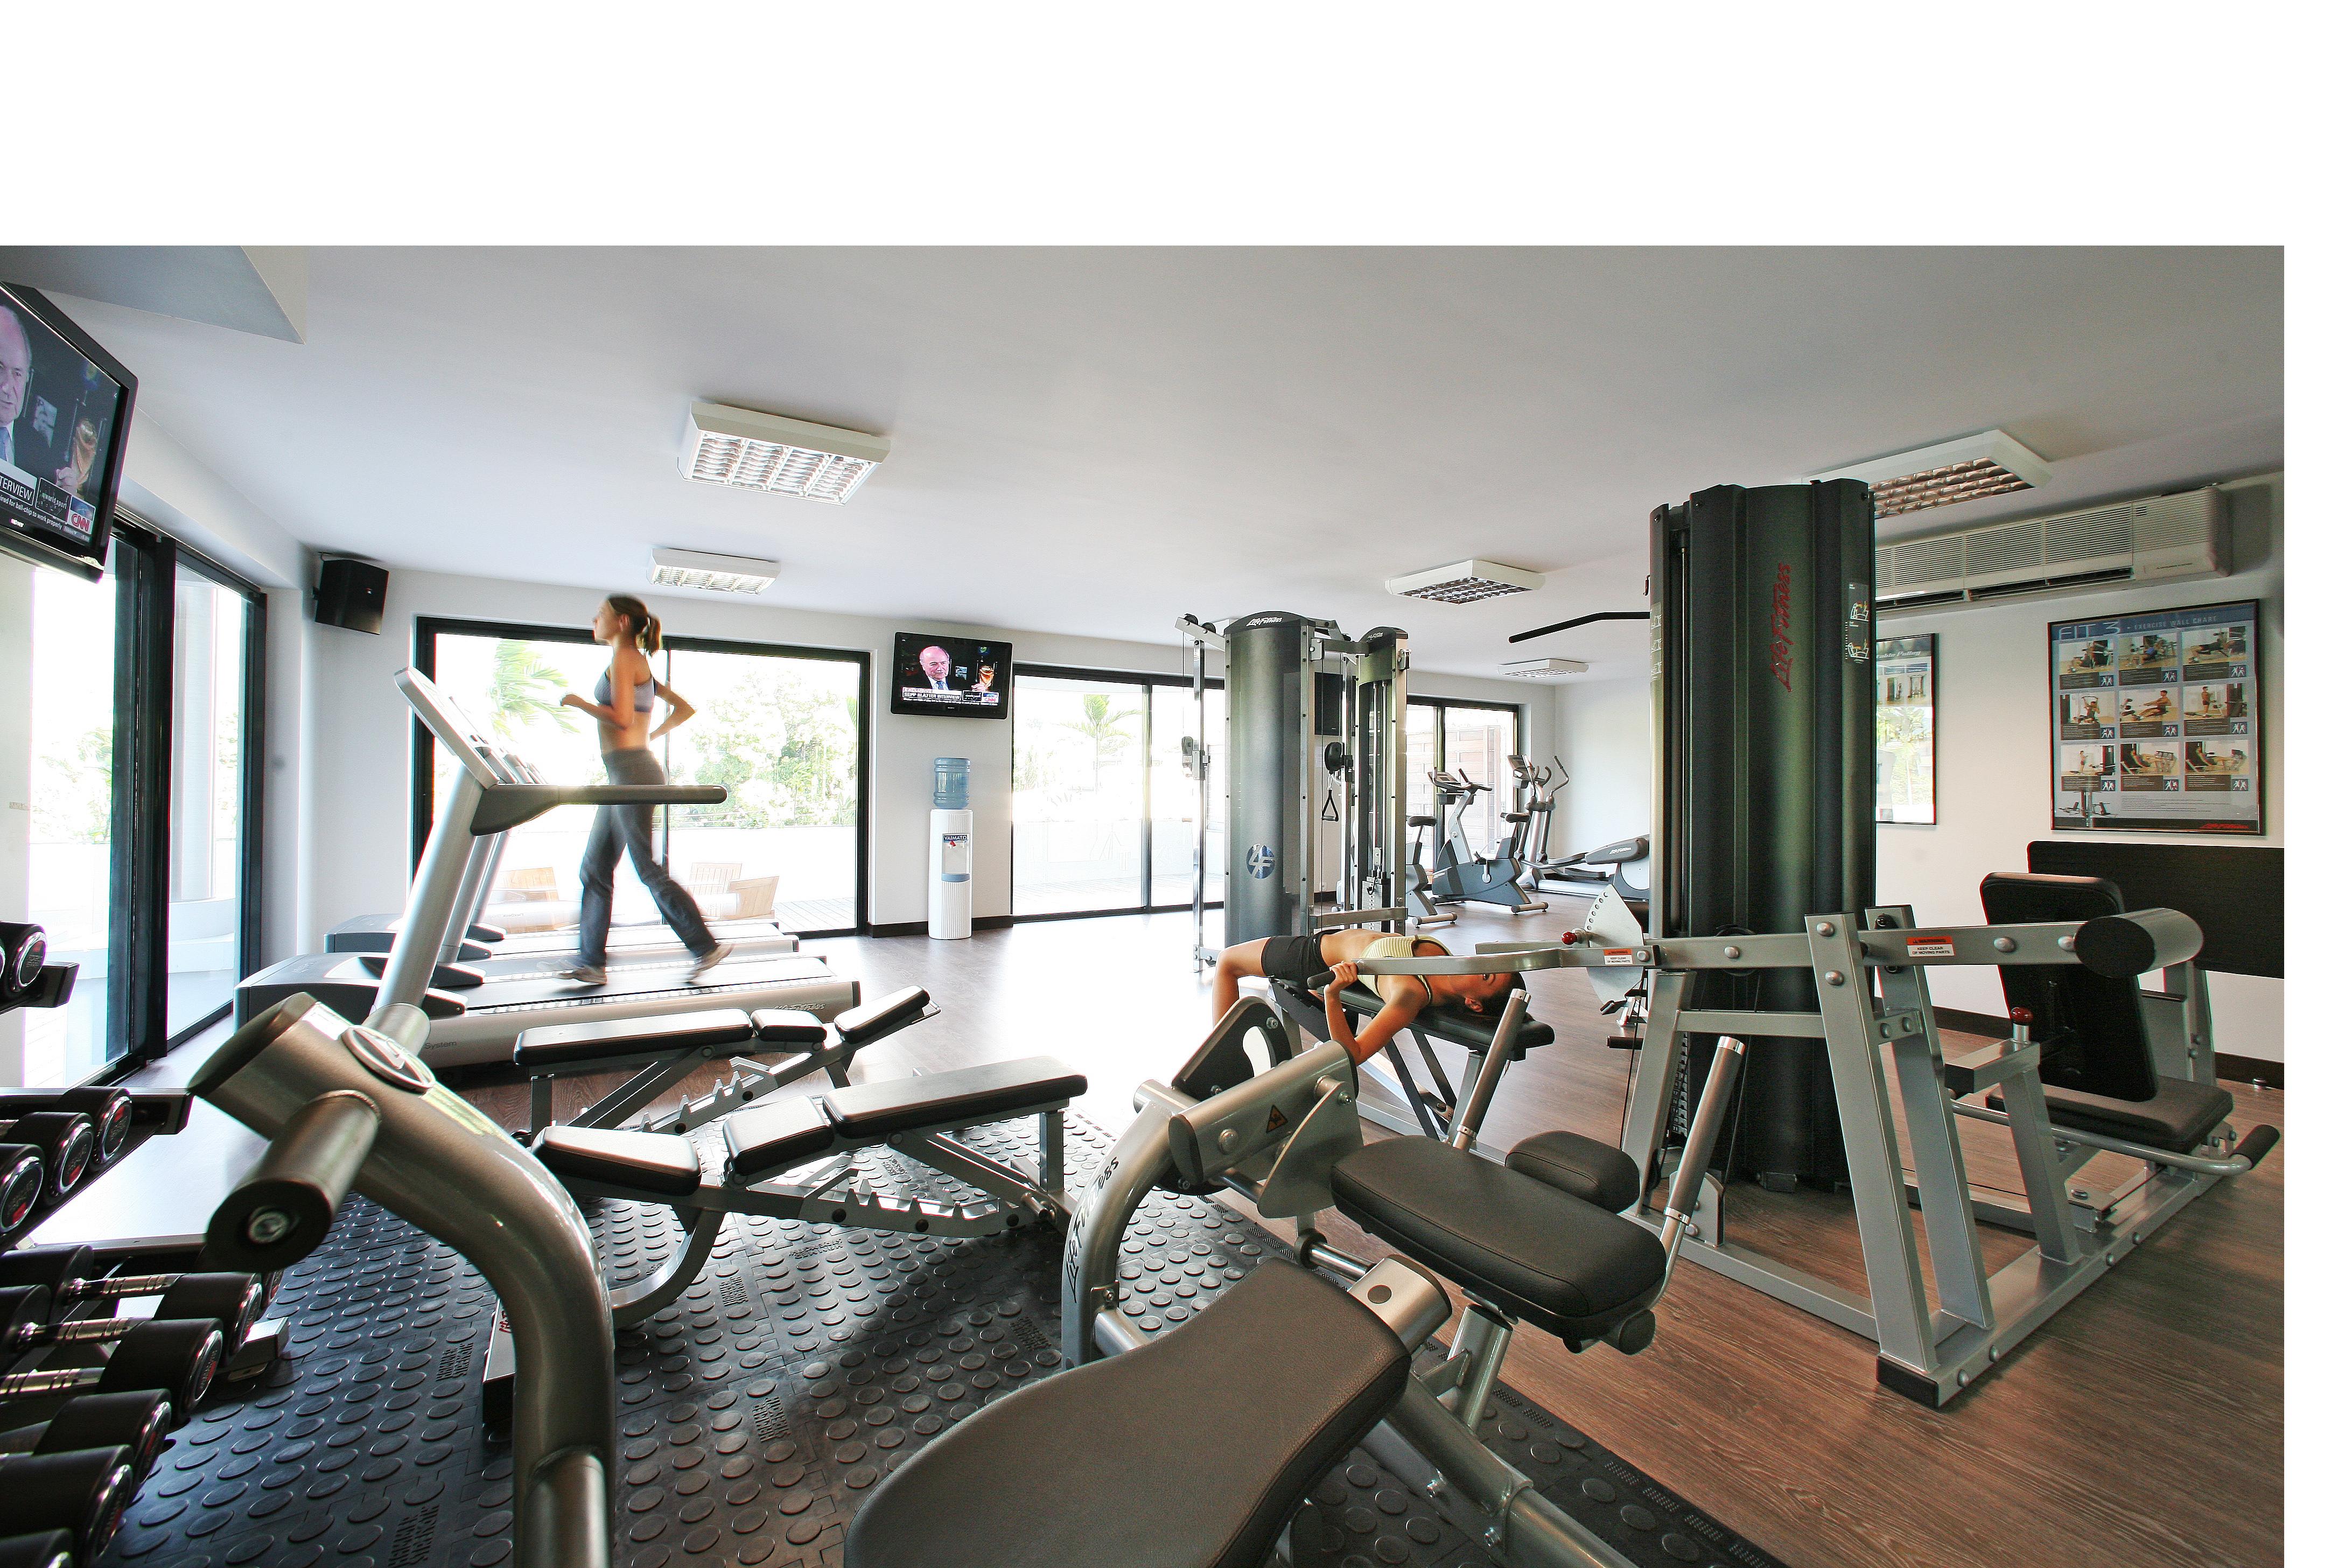 https://tahititourisme.cl/wp-content/uploads/2017/08/Fitness-centre-2.jpg